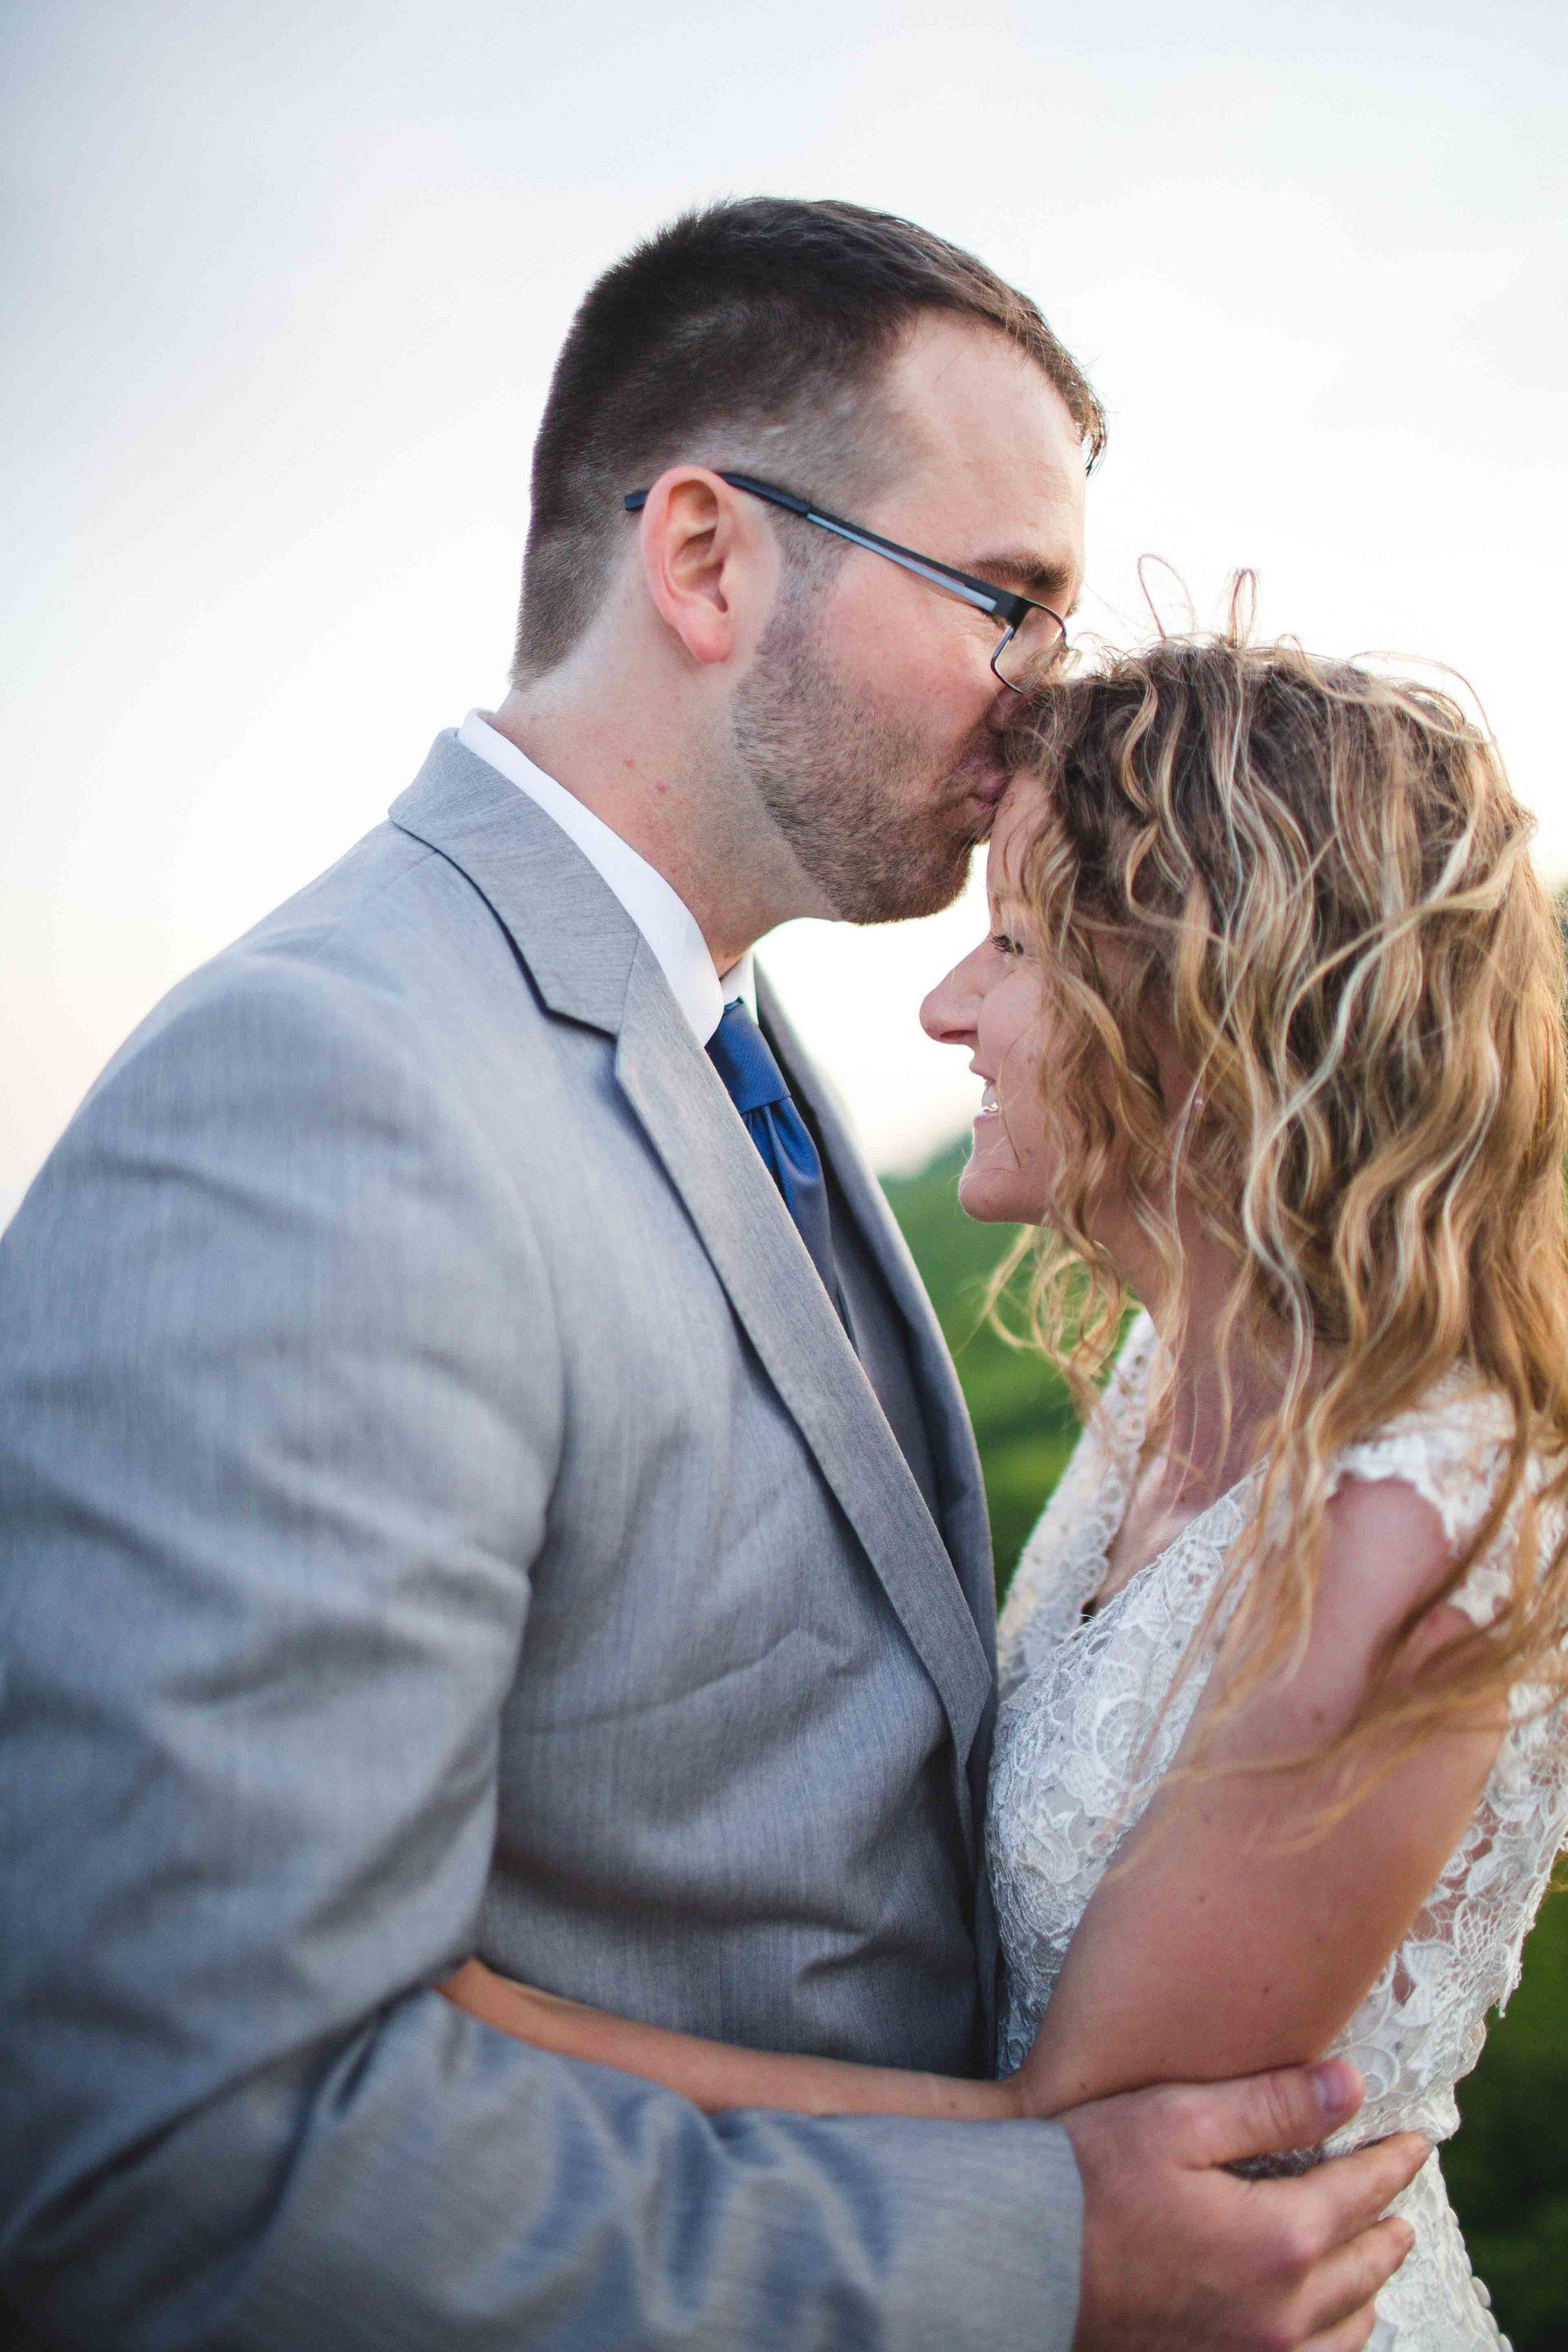 north-carolina-elopement-photographer-58.jpg